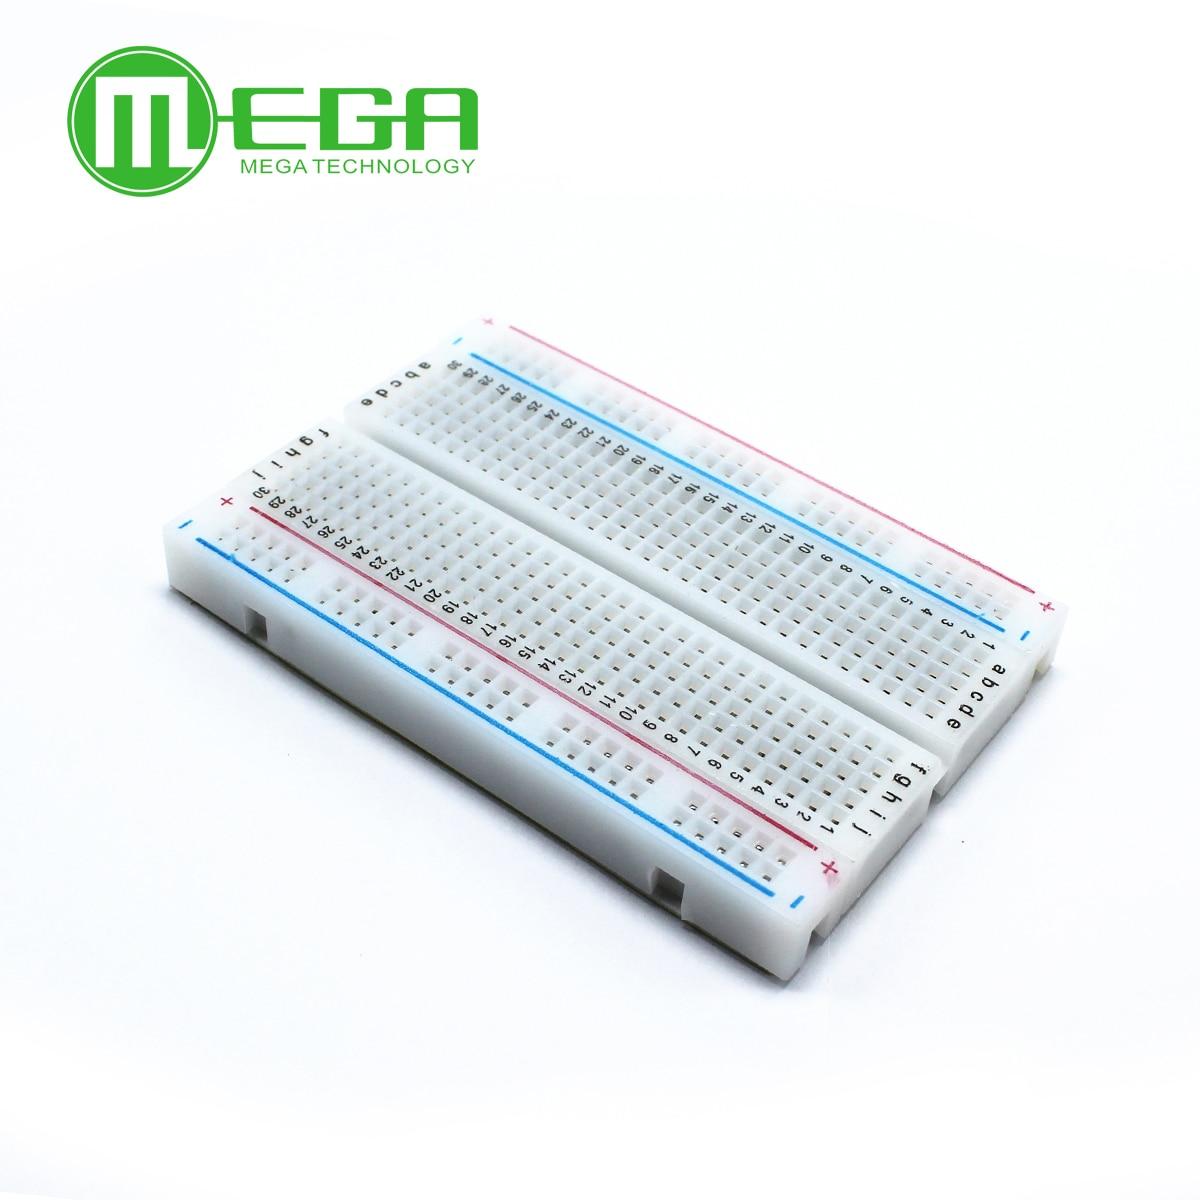 Solderless Breadboard Mini for DIY 83x55-Mm 400-Tie-Point Crystal